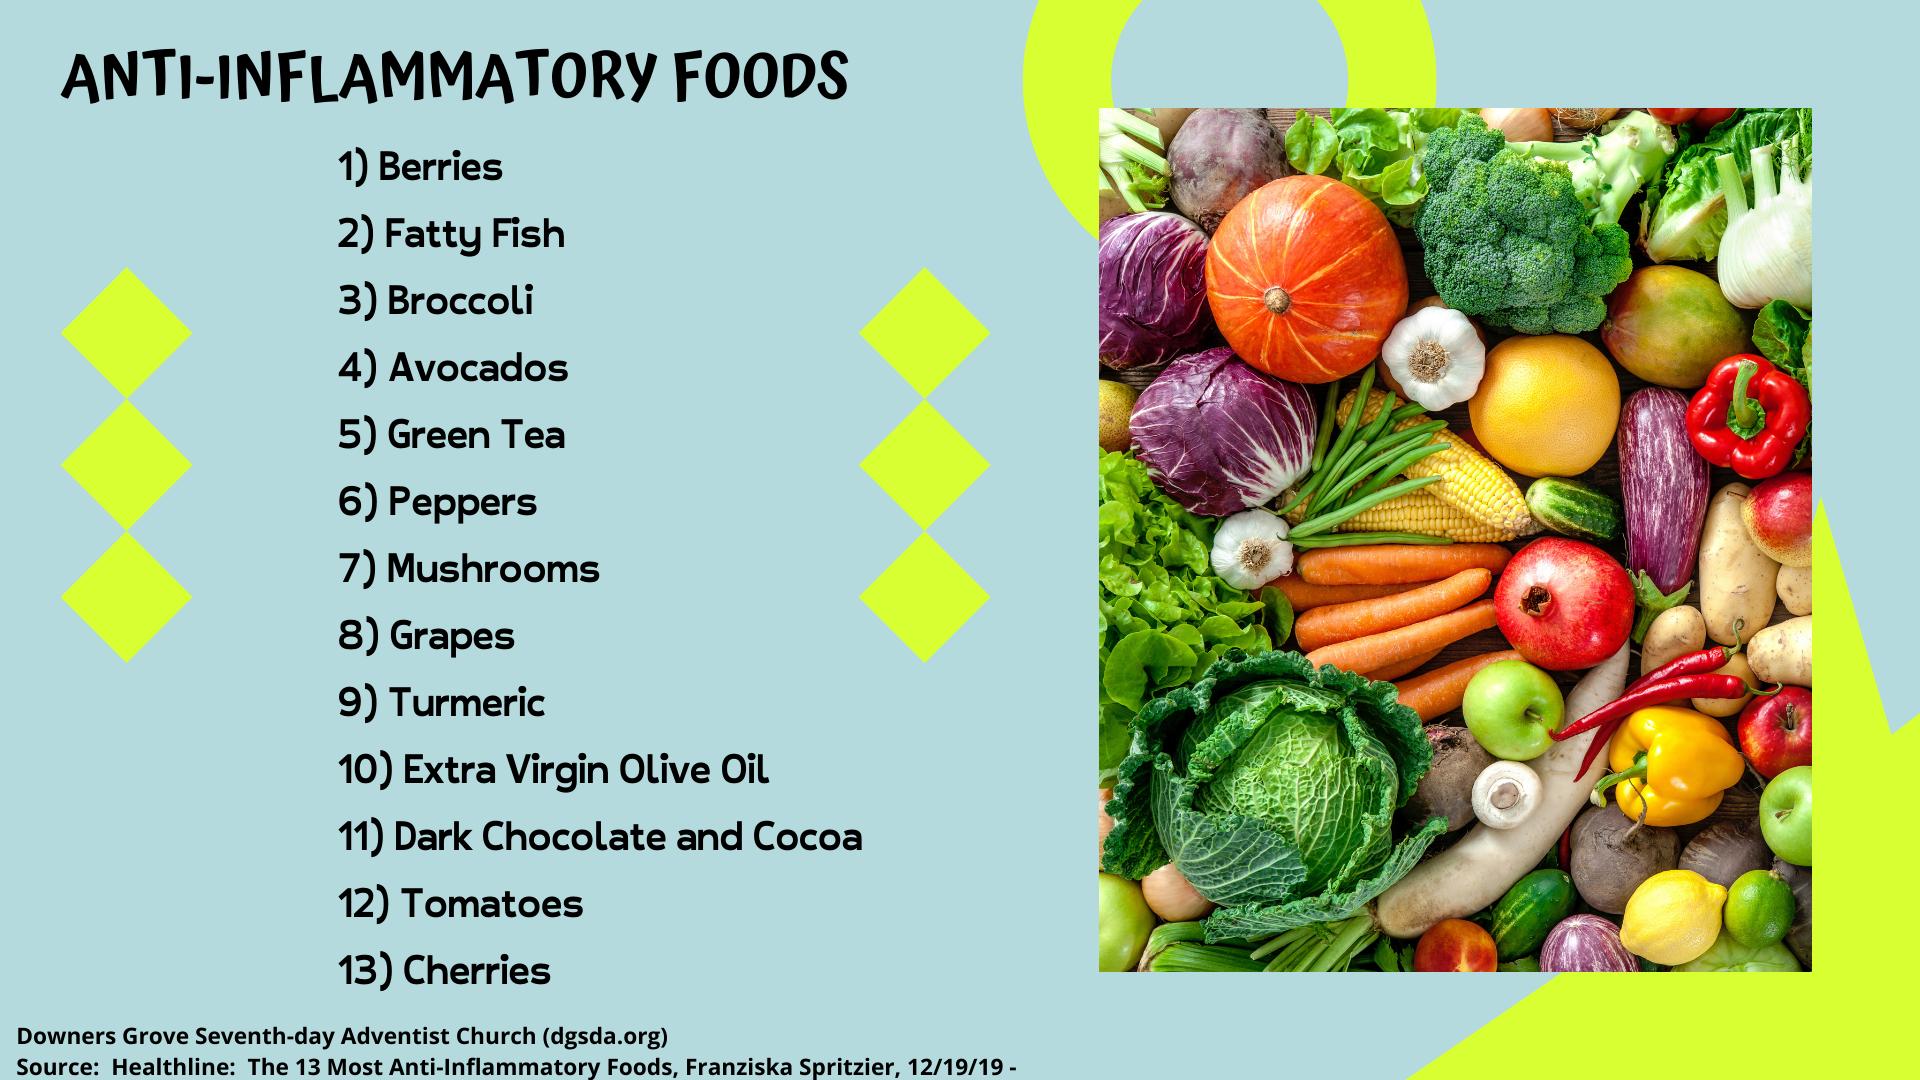 List of Anti-Inflammatory Foods